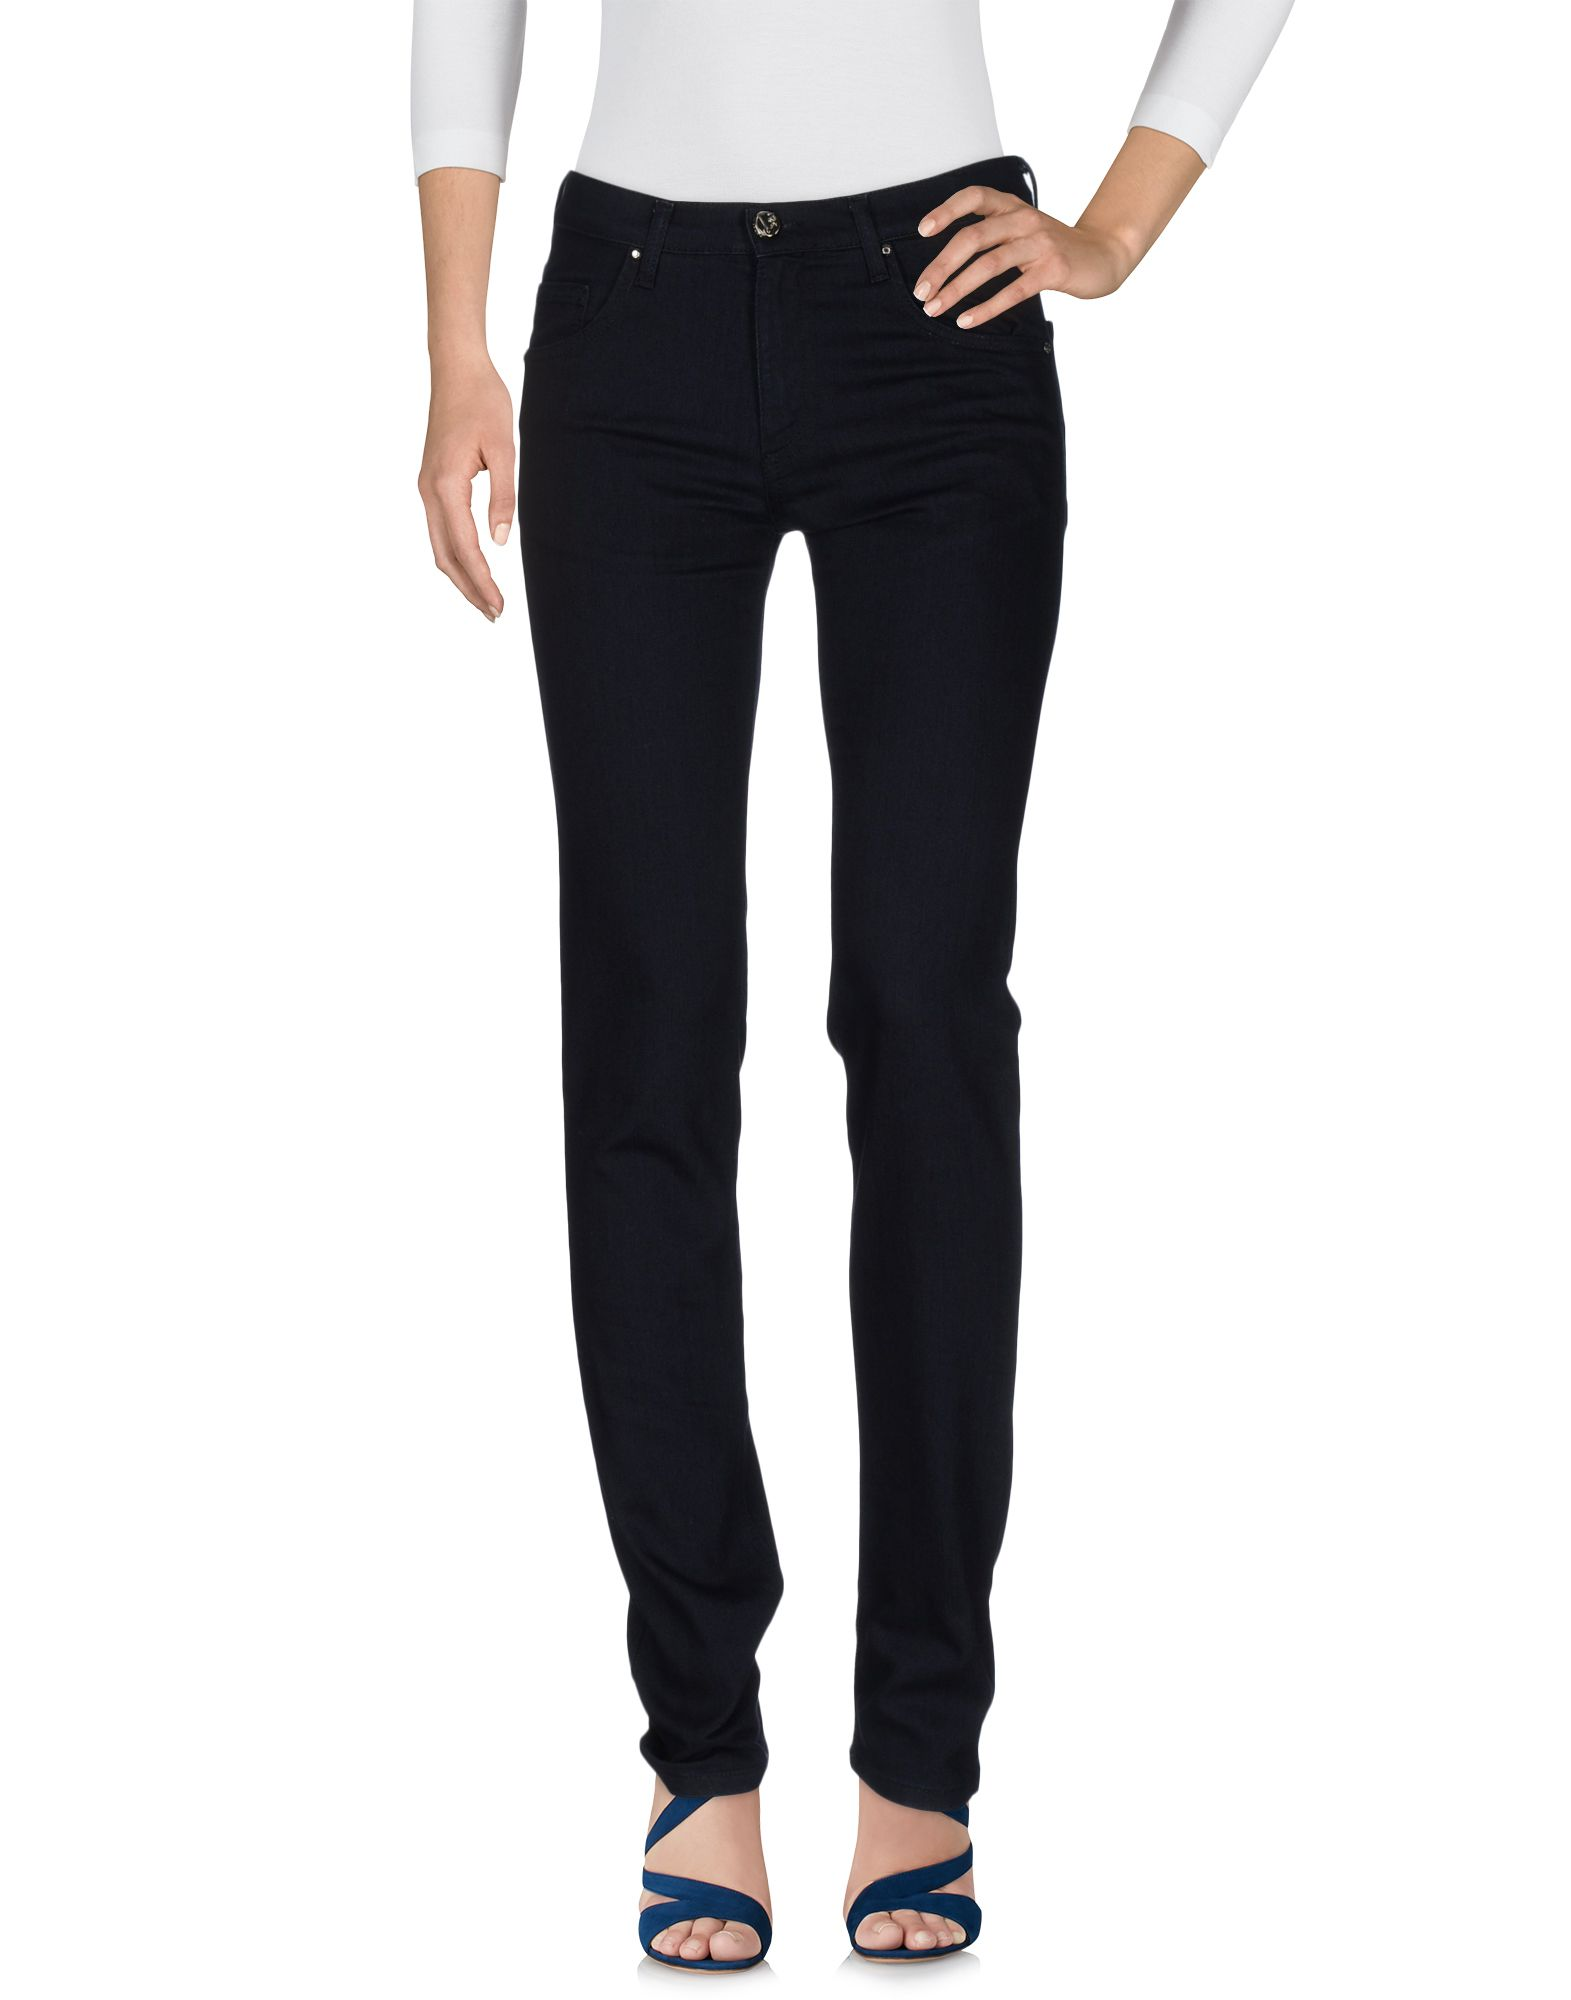 VERSACE JEANS Damen Jeanshose Farbe Dunkelblau Größe 6 - broschei